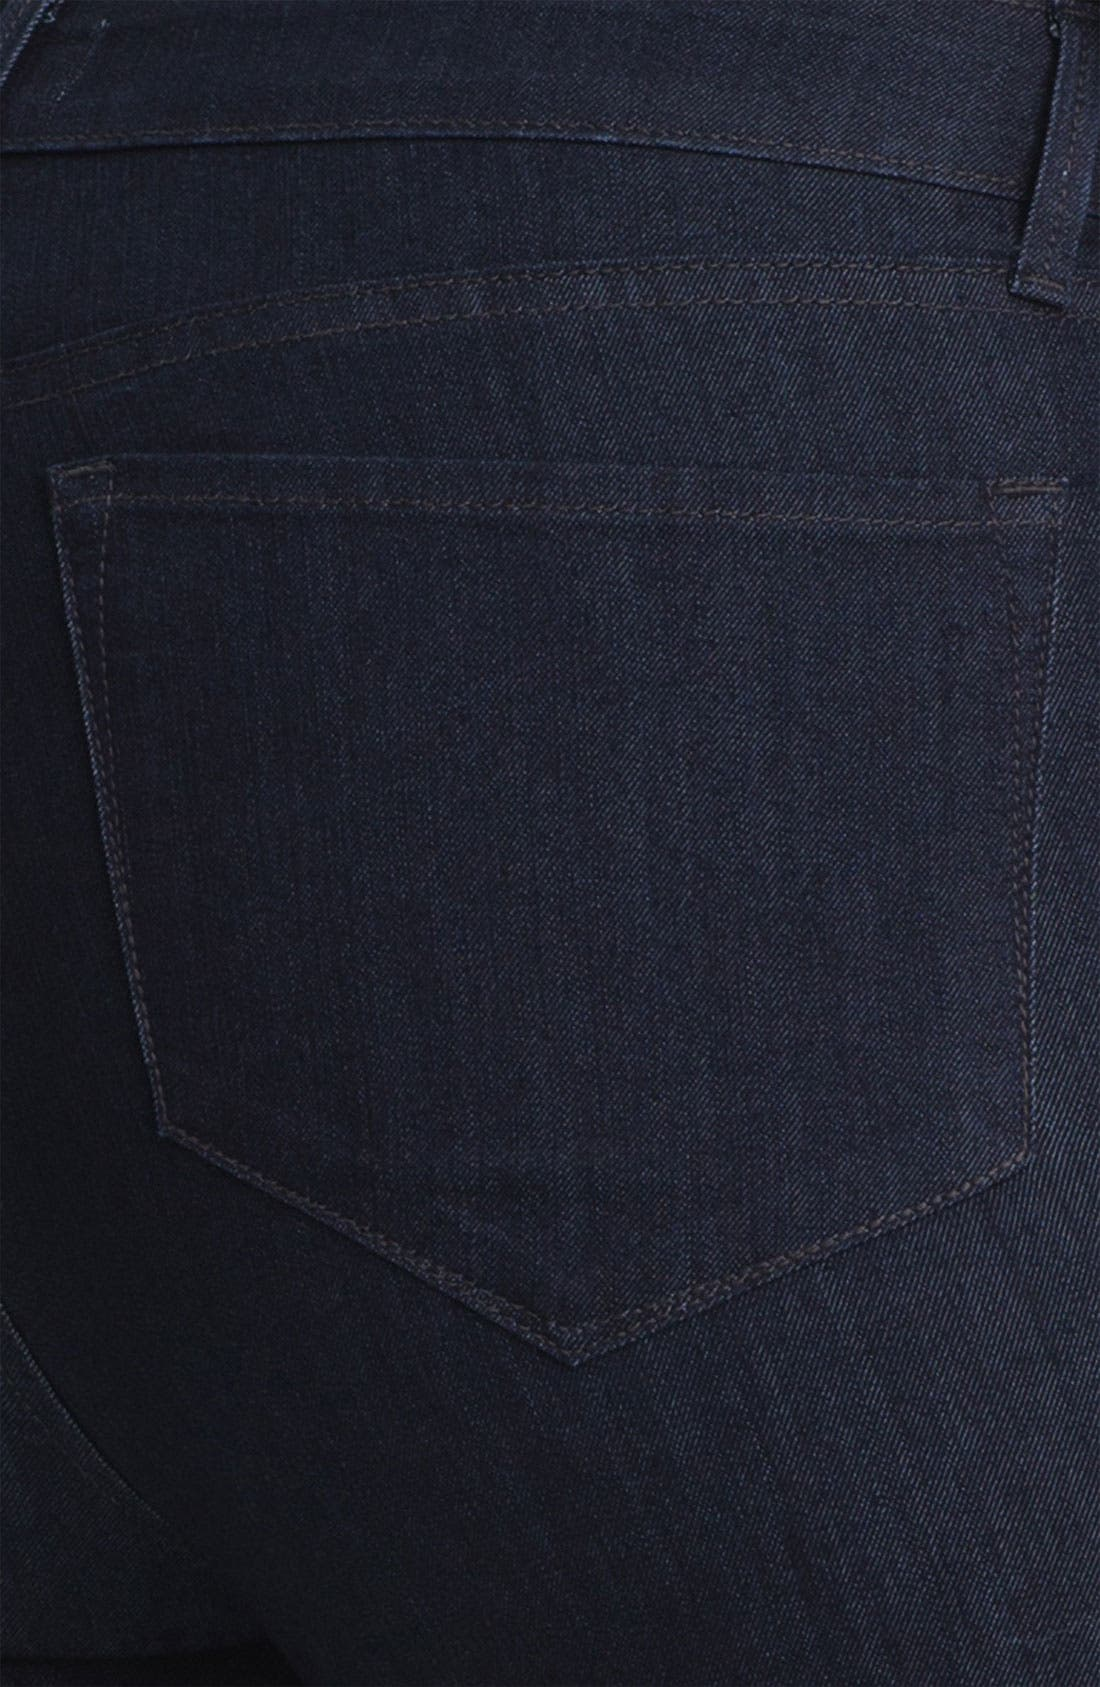 Alternate Image 3  - NYDJ 'Audrey' Stretch Ankle Skinny Jeans (Plus Size)